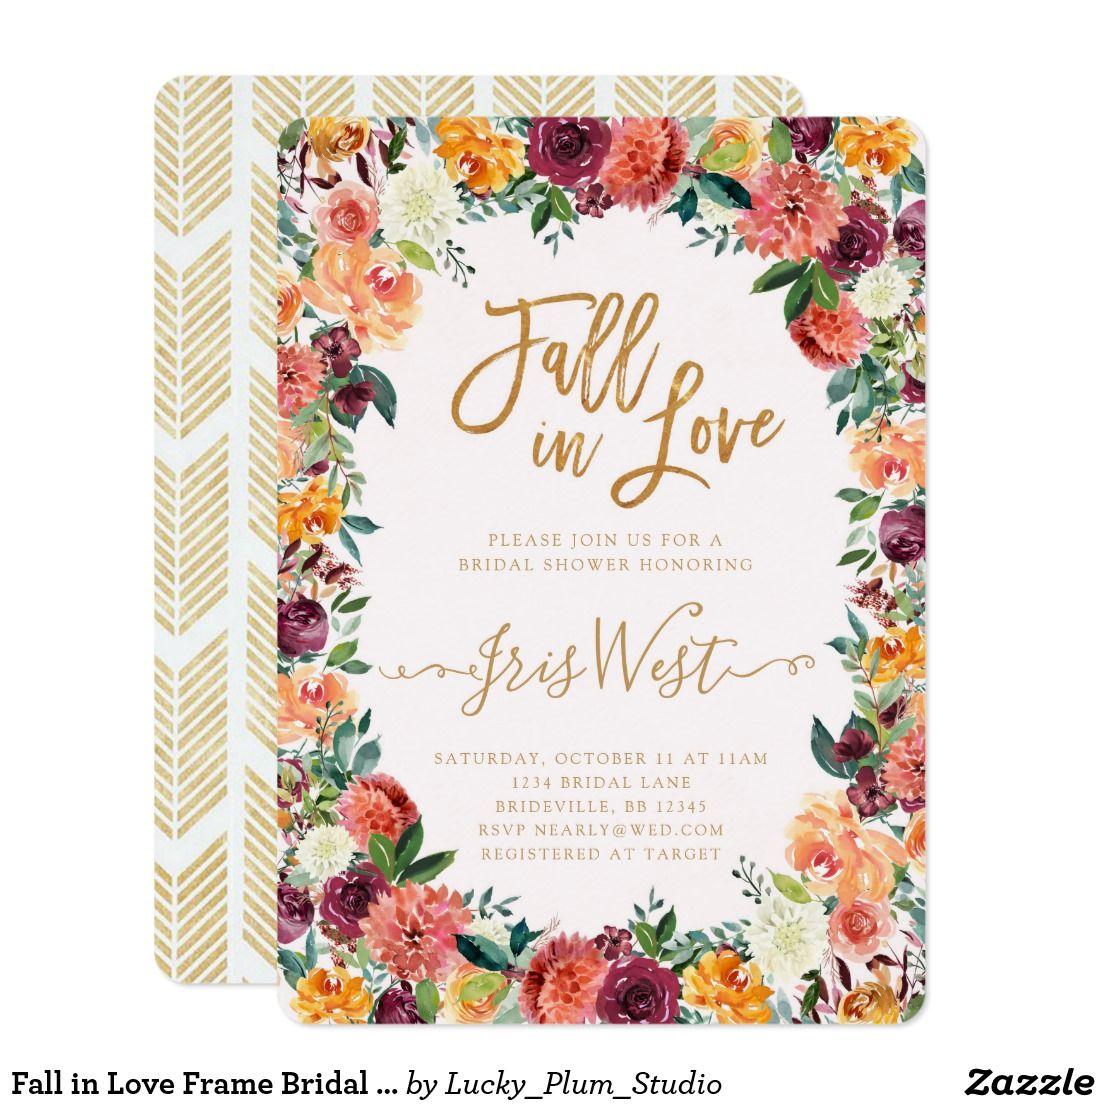 Fall in Love Frame Bridal Shower Invitation | Zazzle.com | Bridal shower  invitations, Floral birthday invitations, Graduation invitations